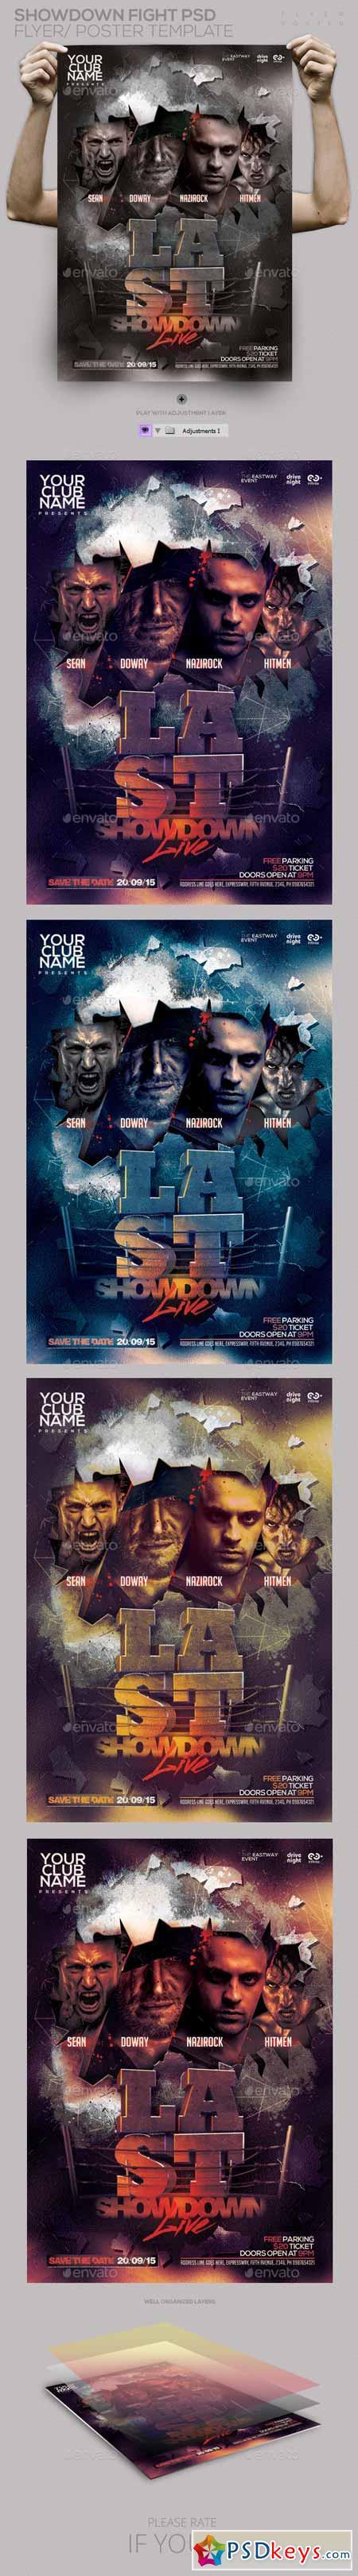 Showdown Fight PSD Flyer Poster 11252809 Free Download Photoshop – Showdown Flyer Template